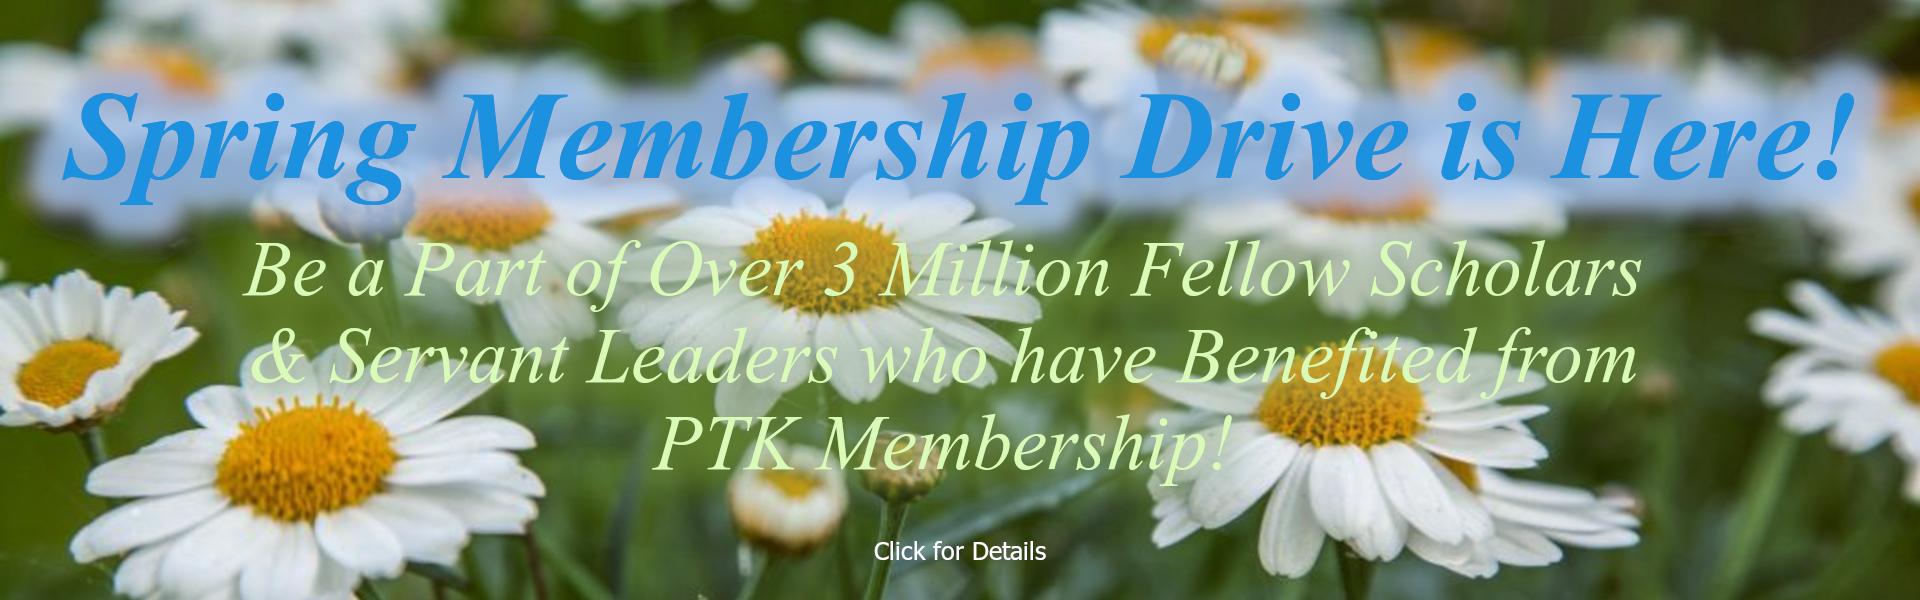 spring-membership